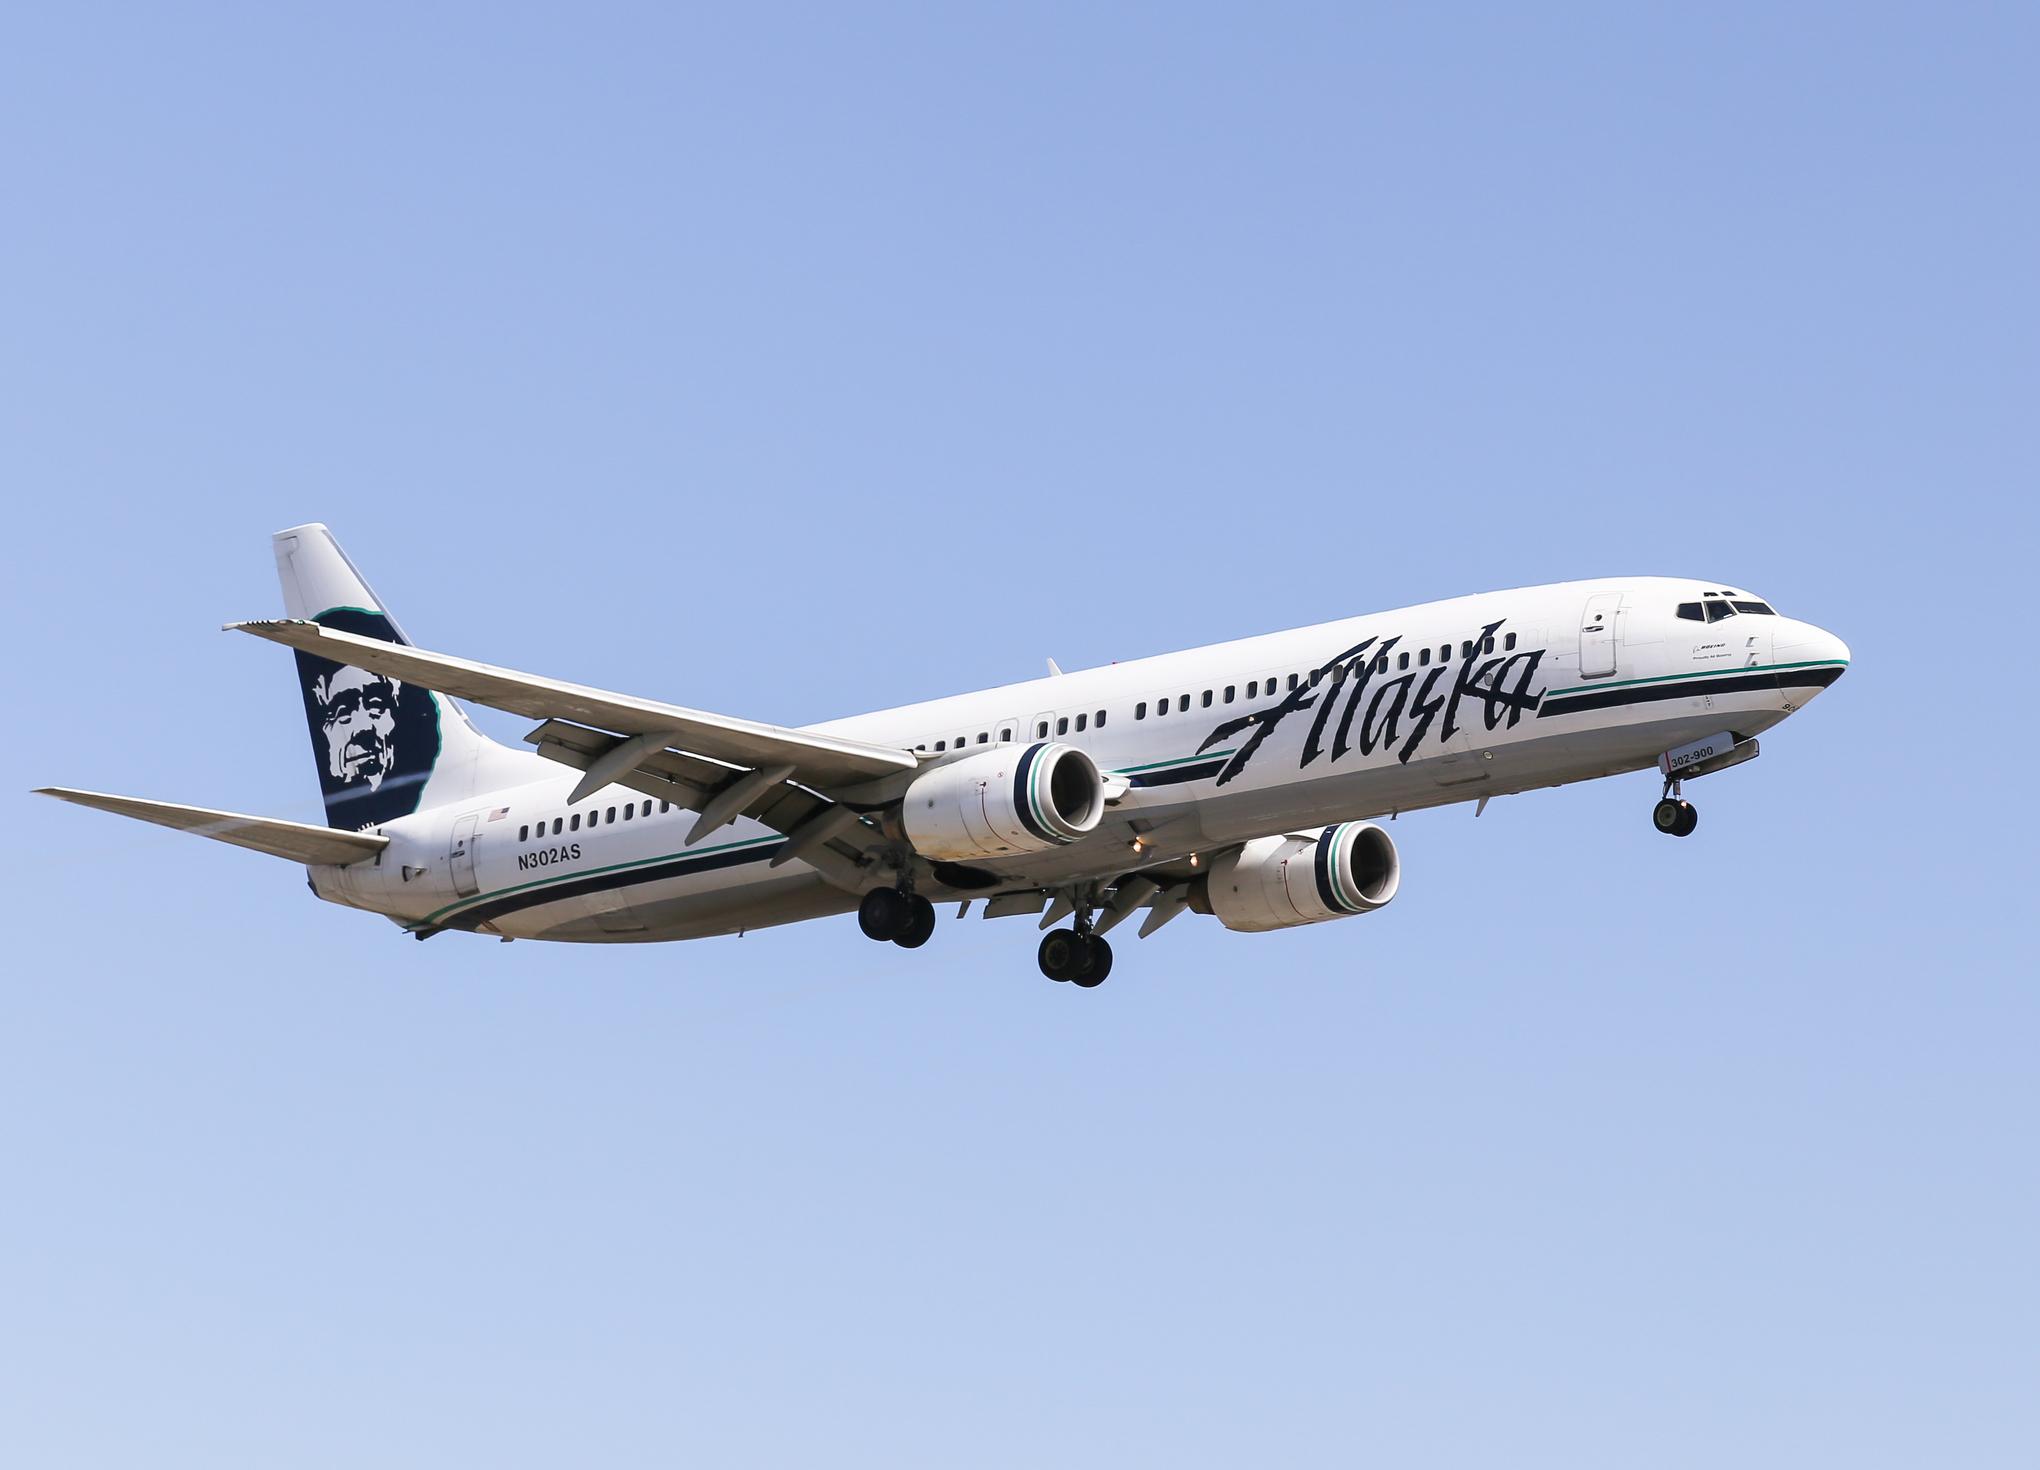 Los Angeles, USA - June 6, 2014: An airplane of Alaska Airlines landing at Los Angeles International Airport.